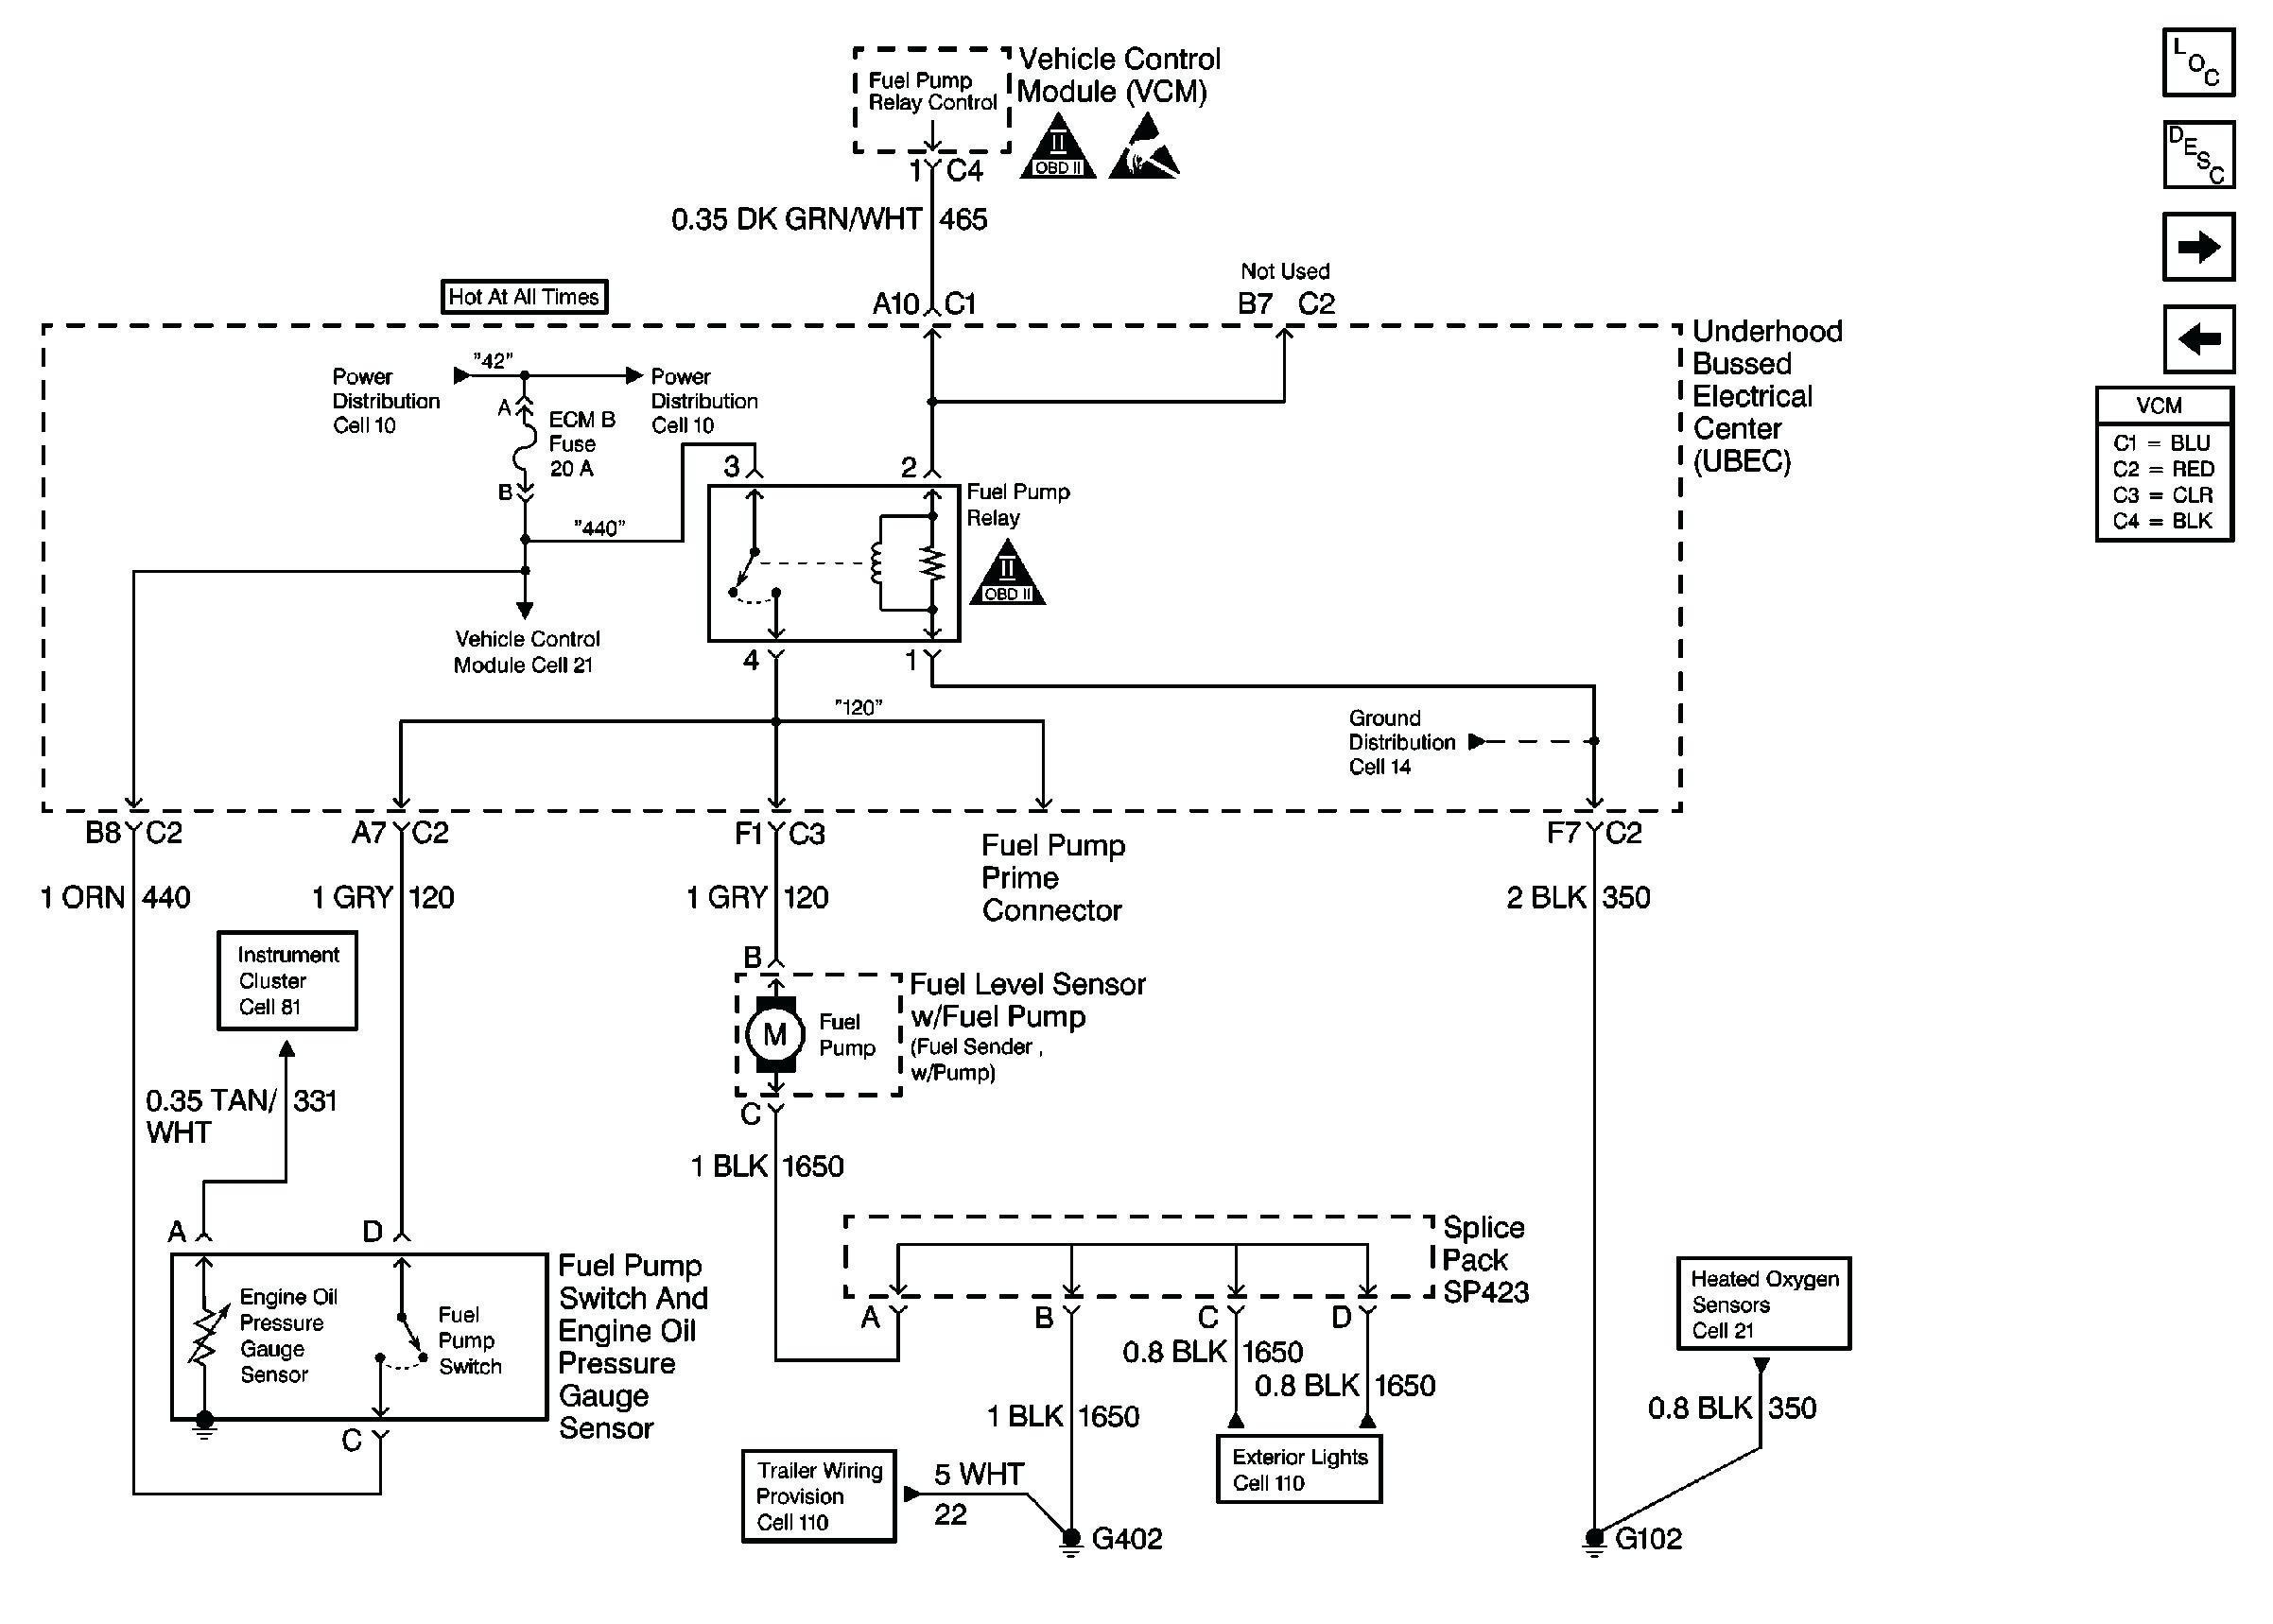 Auto Gauge Tach Wiring Diagram from i0.wp.com